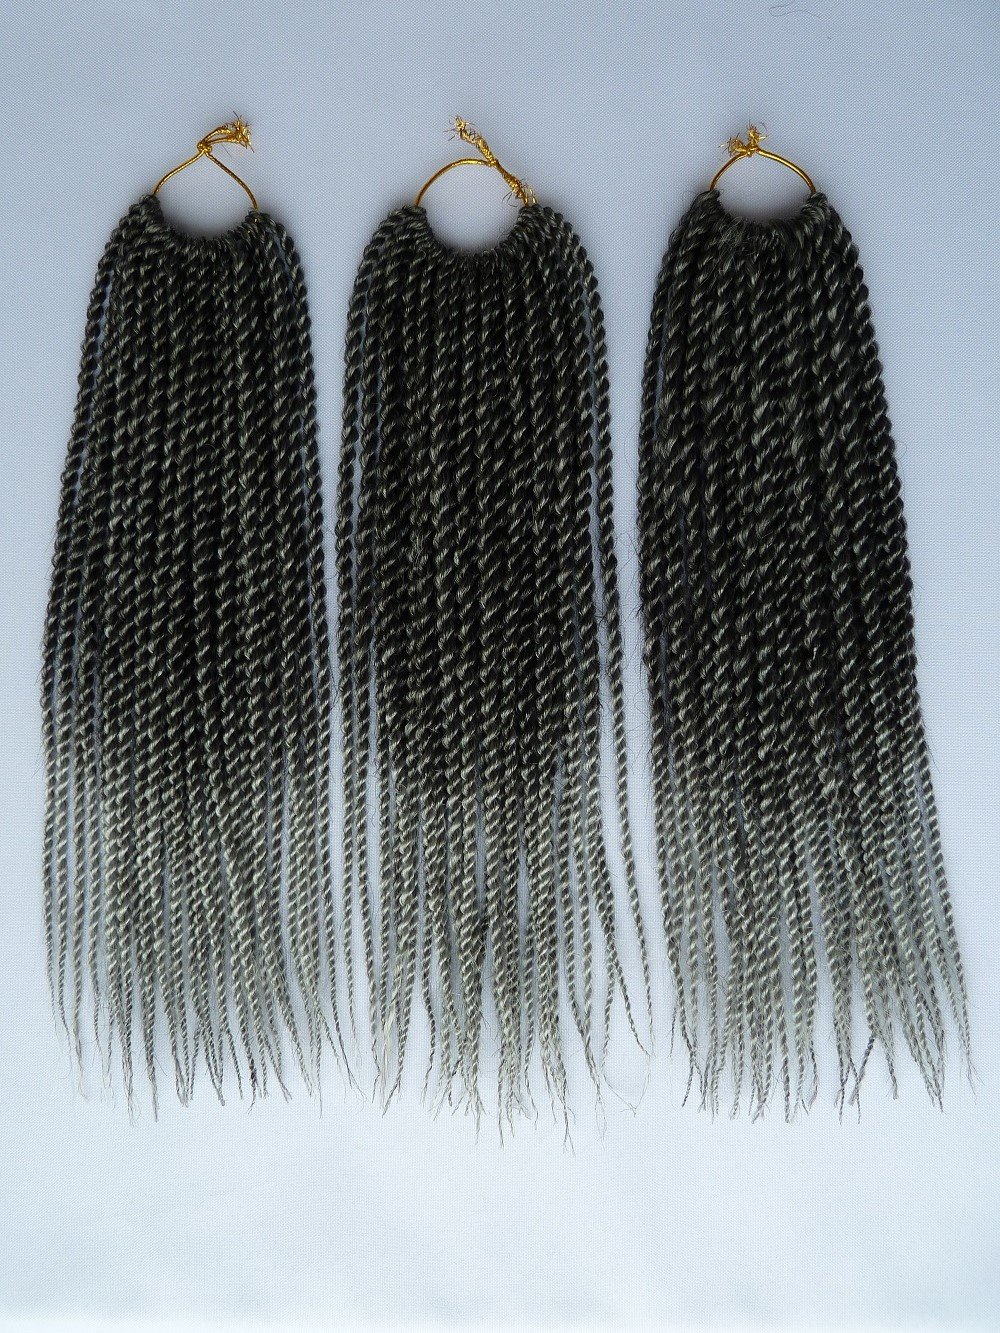 Leyoo 12 Senegalese Twist Crochet Hair (120 Roots/Box) Thin Havana Mambo Crochet Braids Hair Extension For Kids (CA M1B/27)